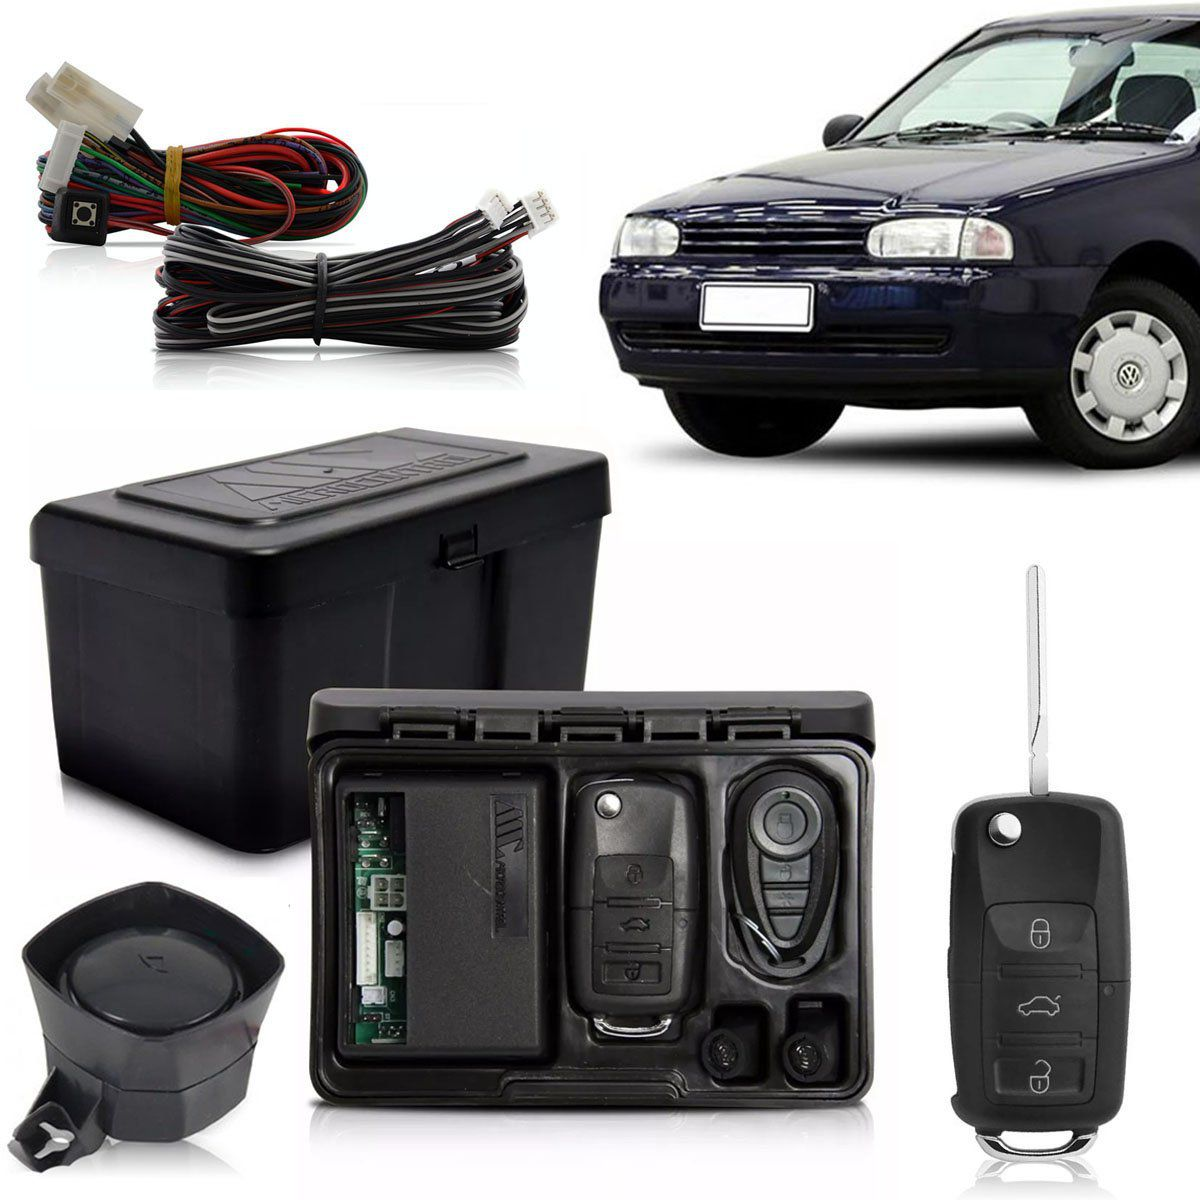 Alarme Automotivo Bloqueador Anti-furto Chave Canivete Gol Bola 1994 Até 2003